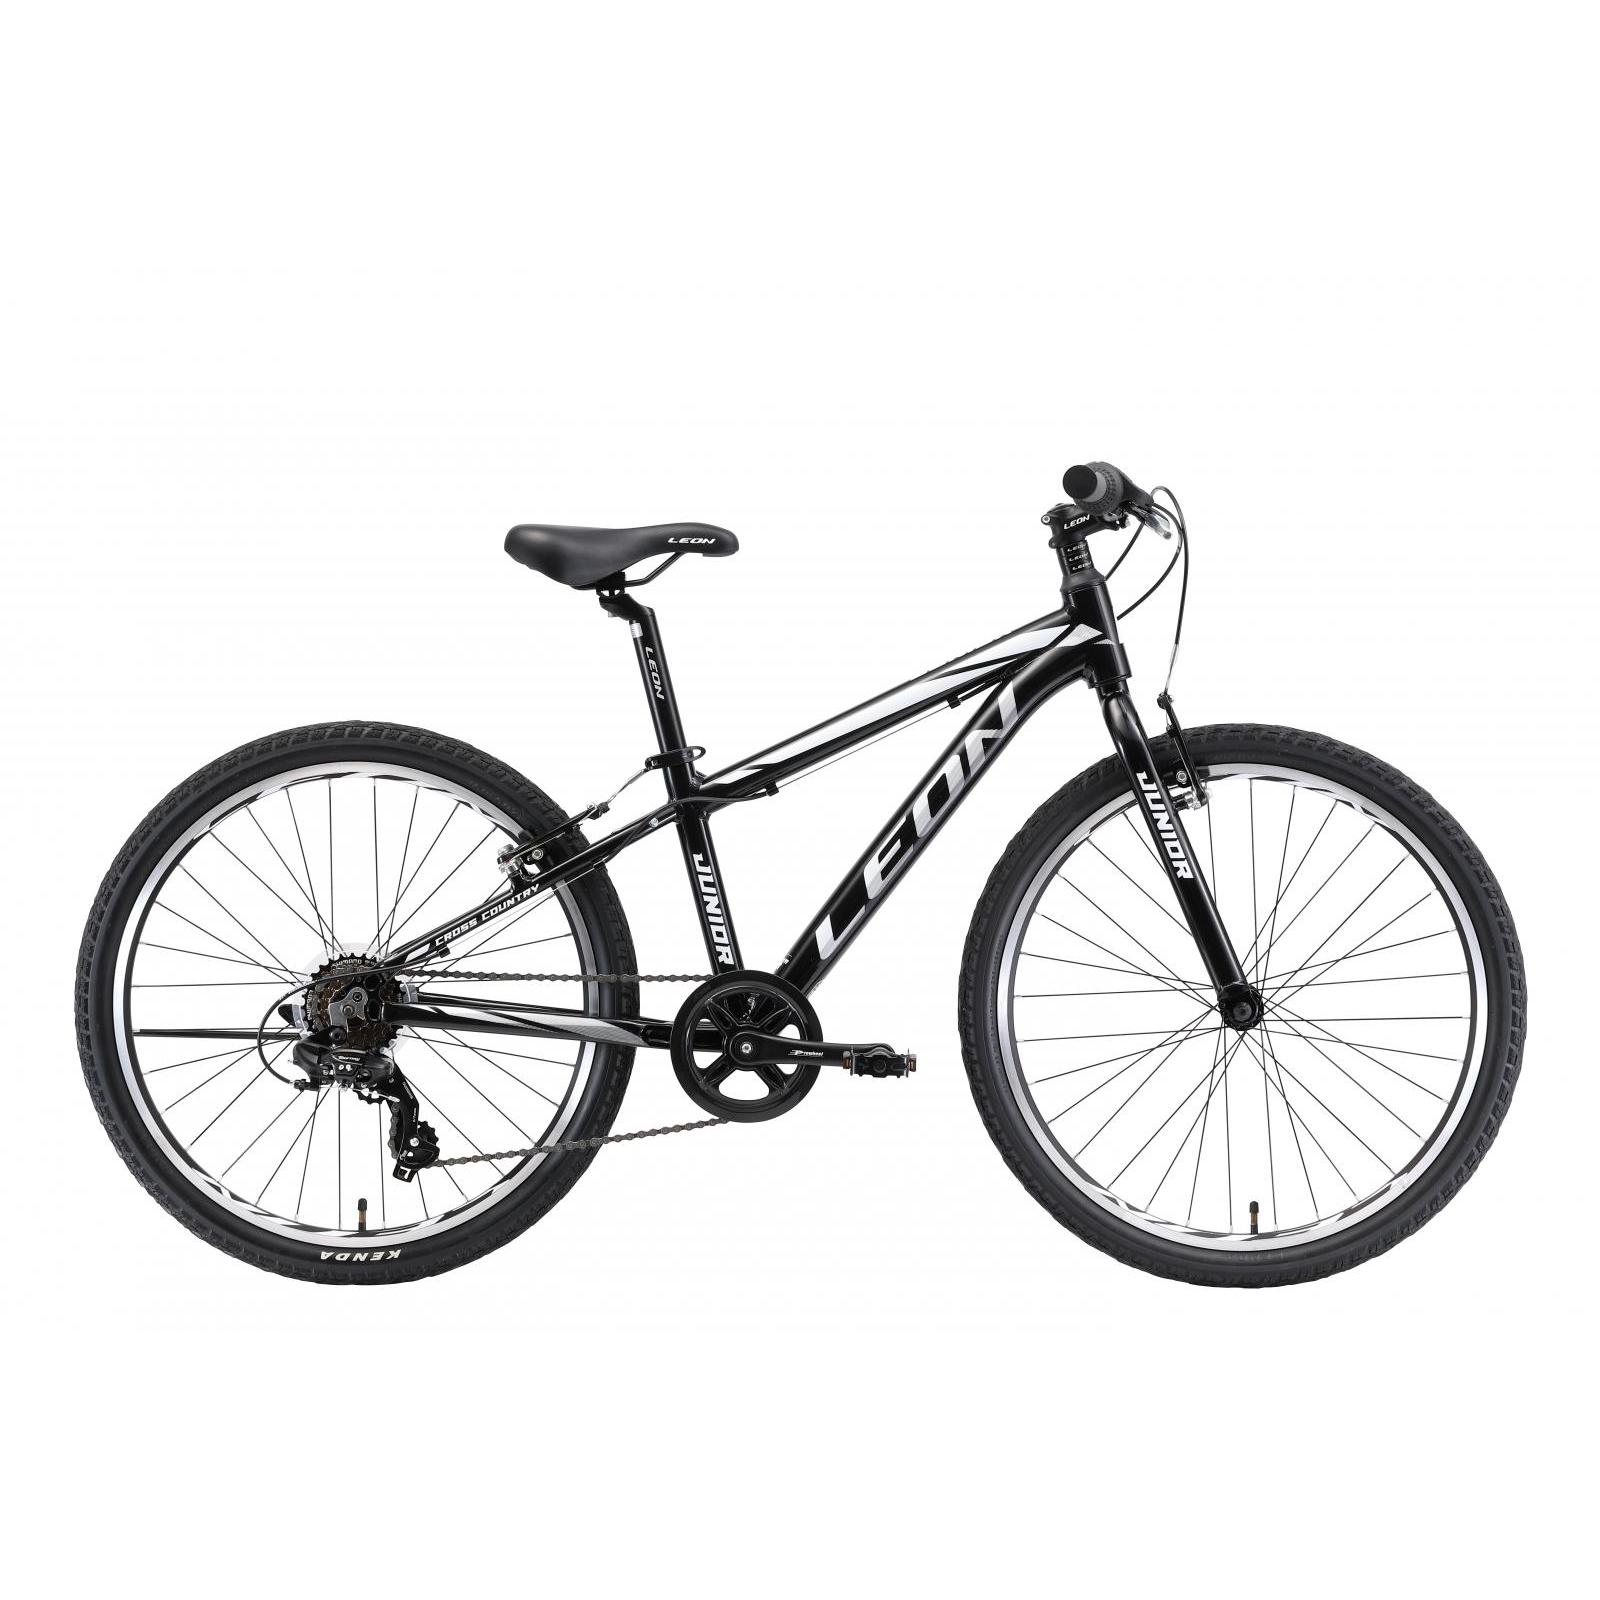 "Велосипед Leon 24"" JUNIOR 2018 AM 14G Vbr рама-12,5"" Al чёрно-белый (OPS-LN-24-018)"